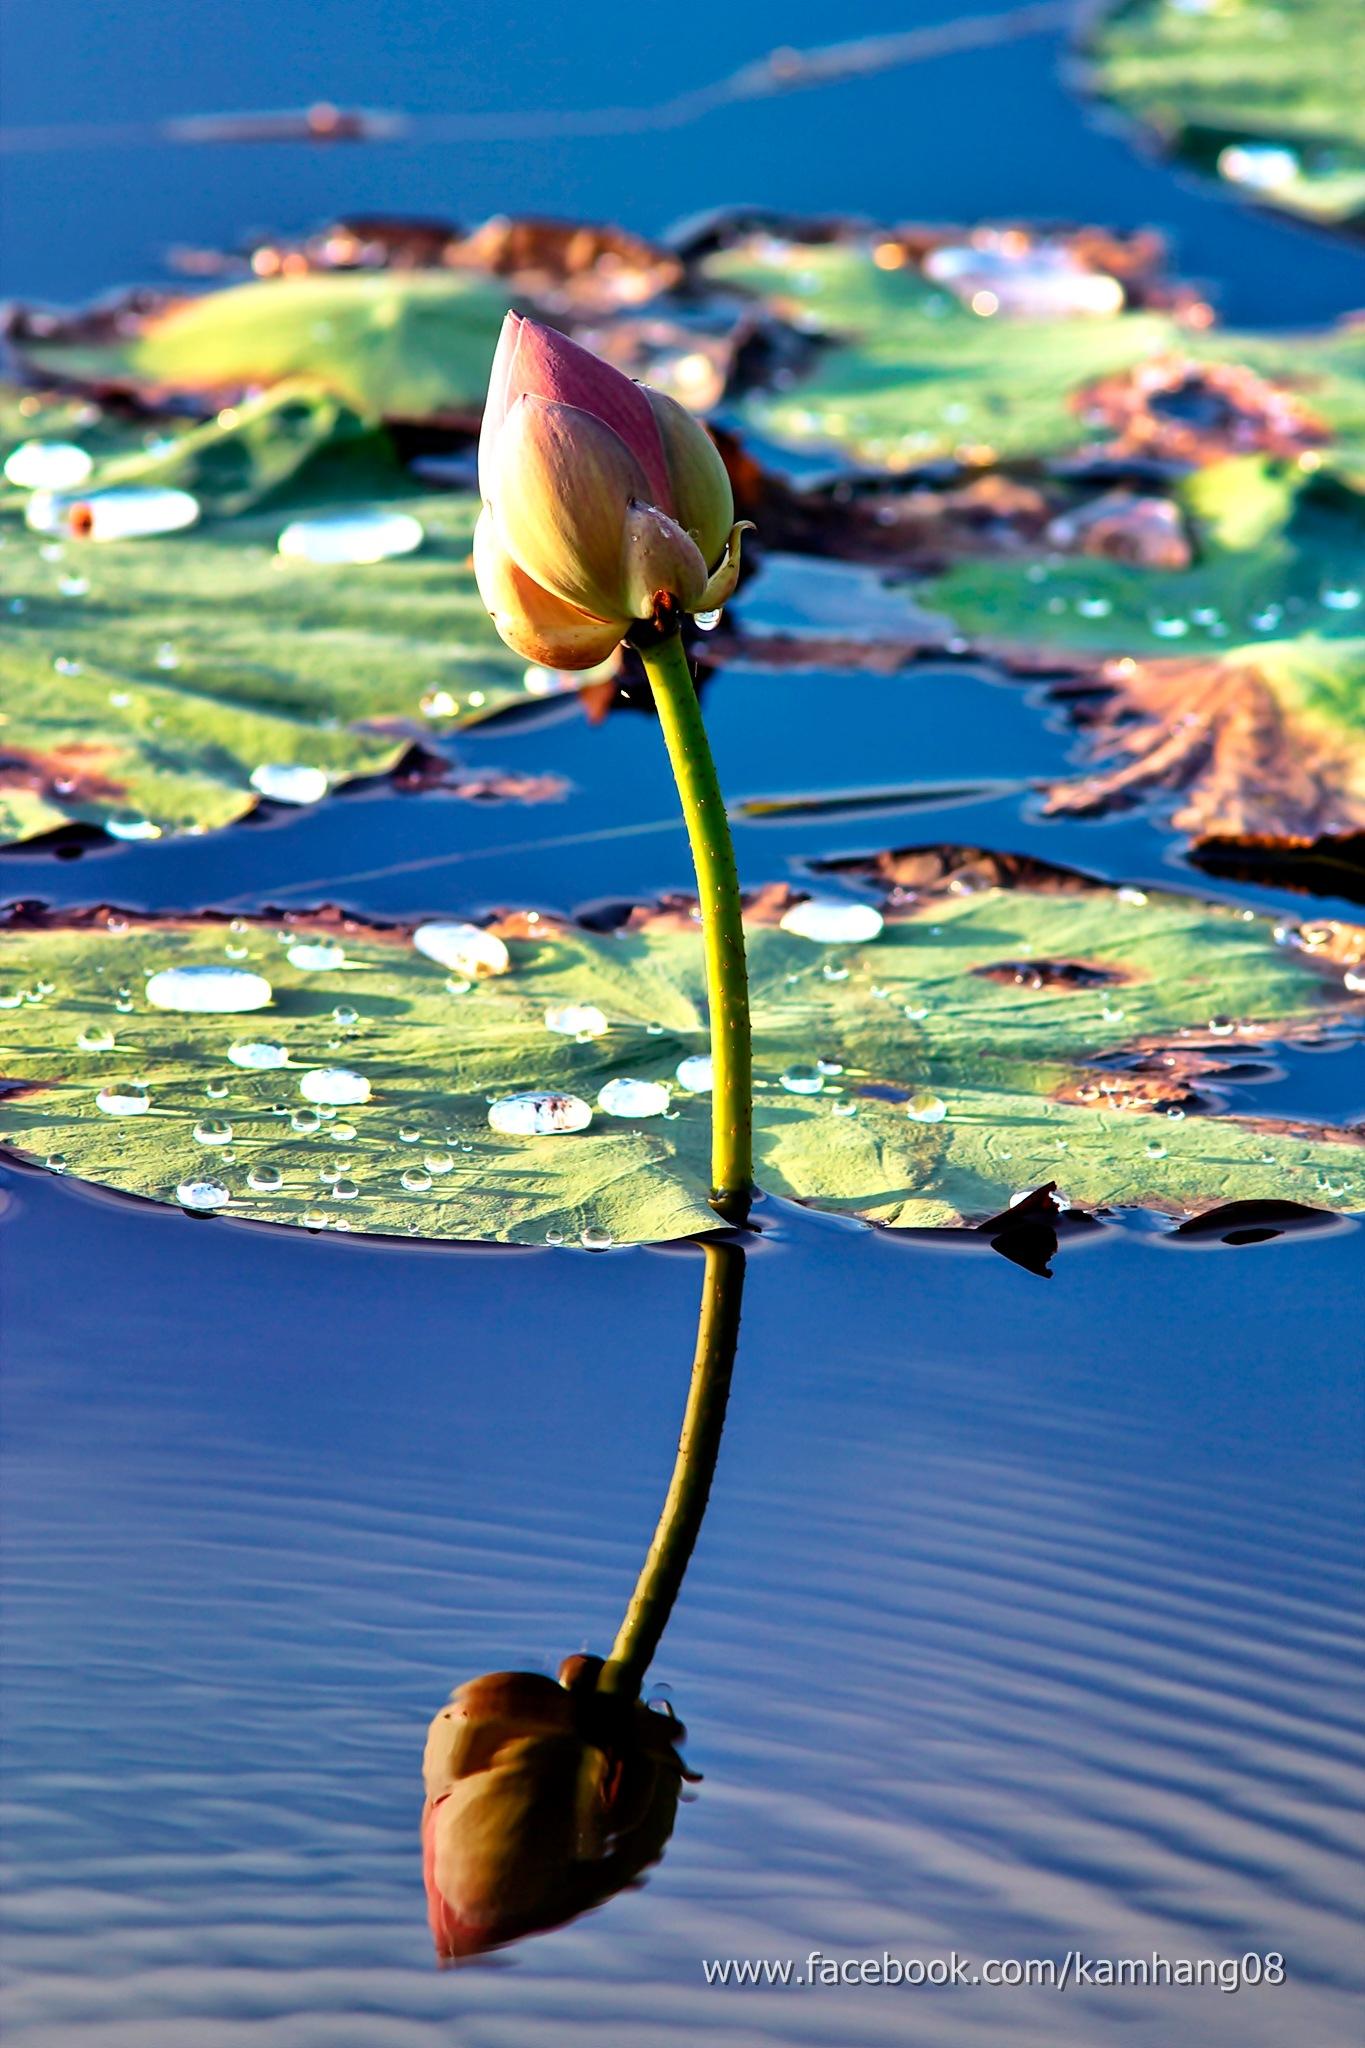 Lotus by kamhang kungquang